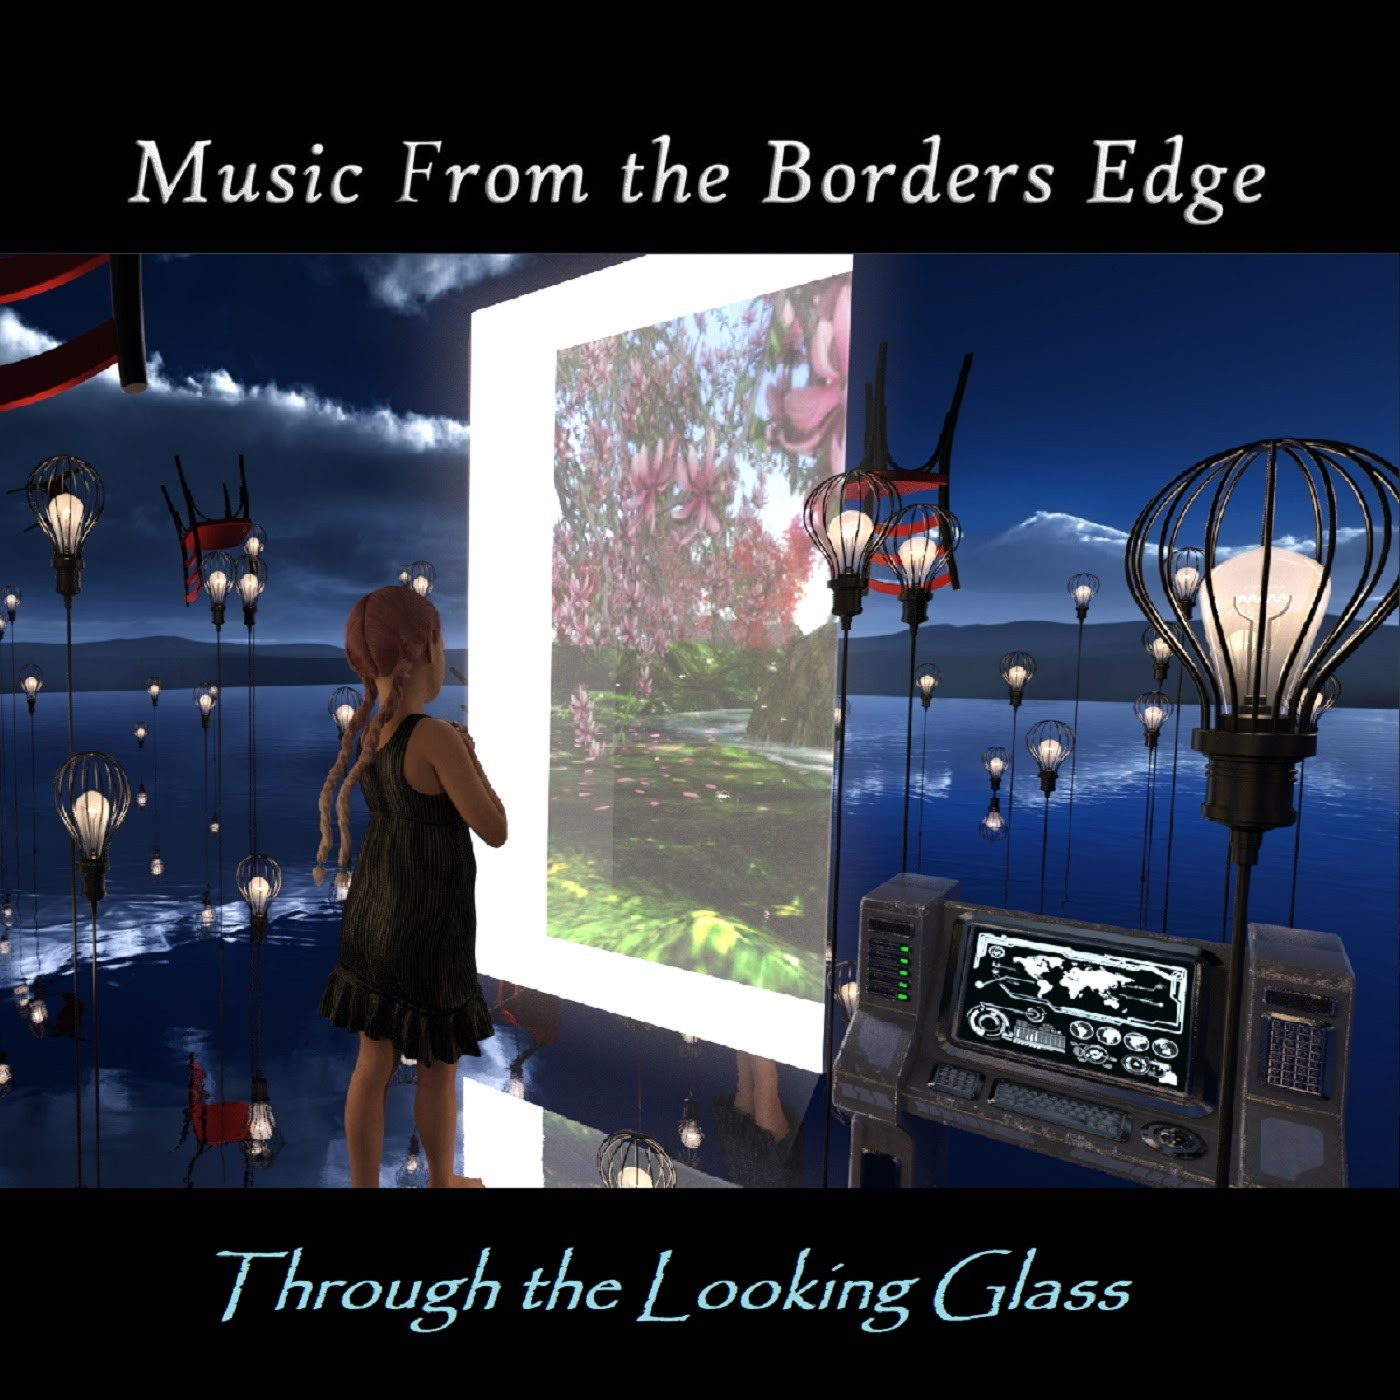 https://bordersedge.bandcamp.com/album/though-the-looking-glass